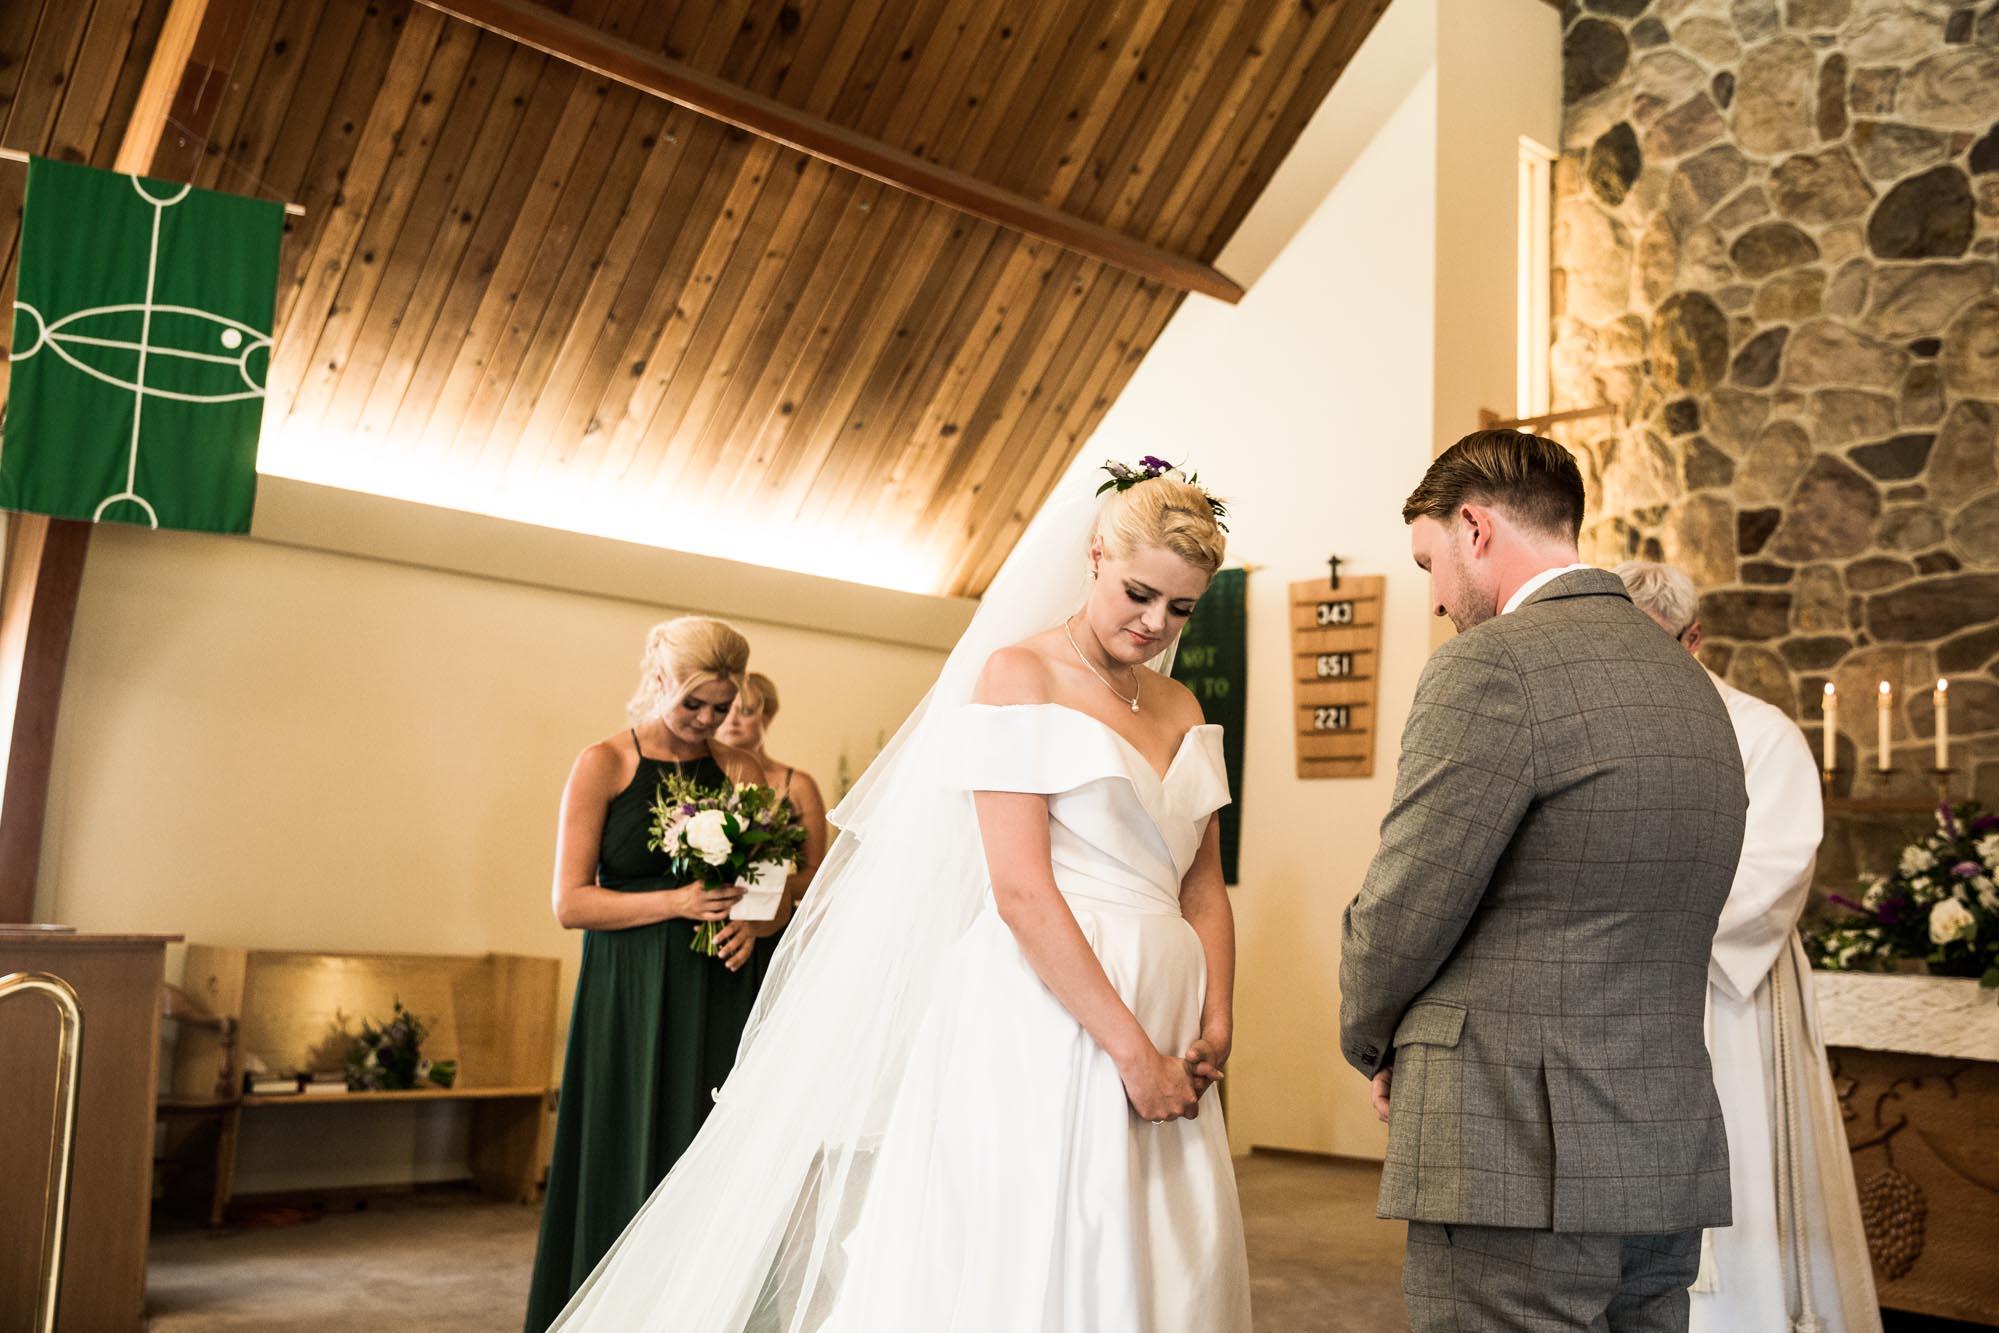 Calgary wedding photographer, photos at the church ceremony